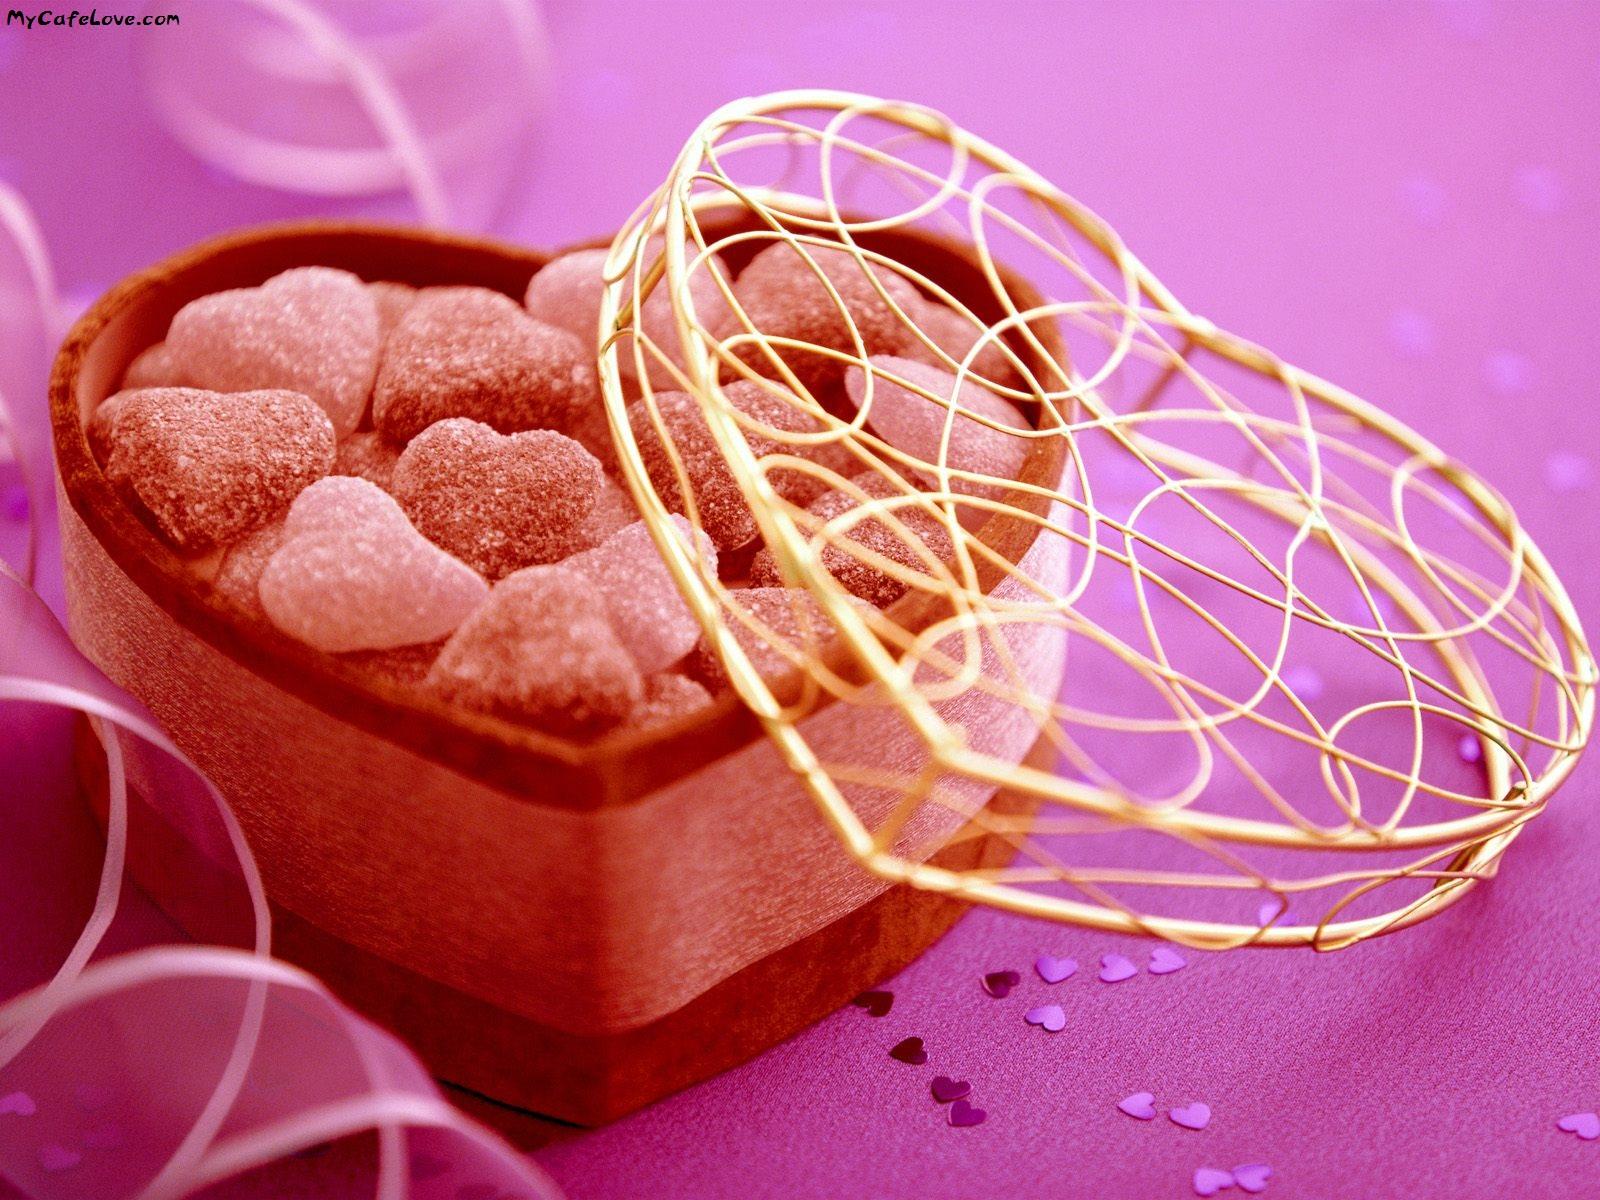 http://3.bp.blogspot.com/-v_IBBJh4VRk/URE1R5_e29I/AAAAAAAAGYE/prO7Z6_pT0U/s1600/valentine+day+sweet.jpg